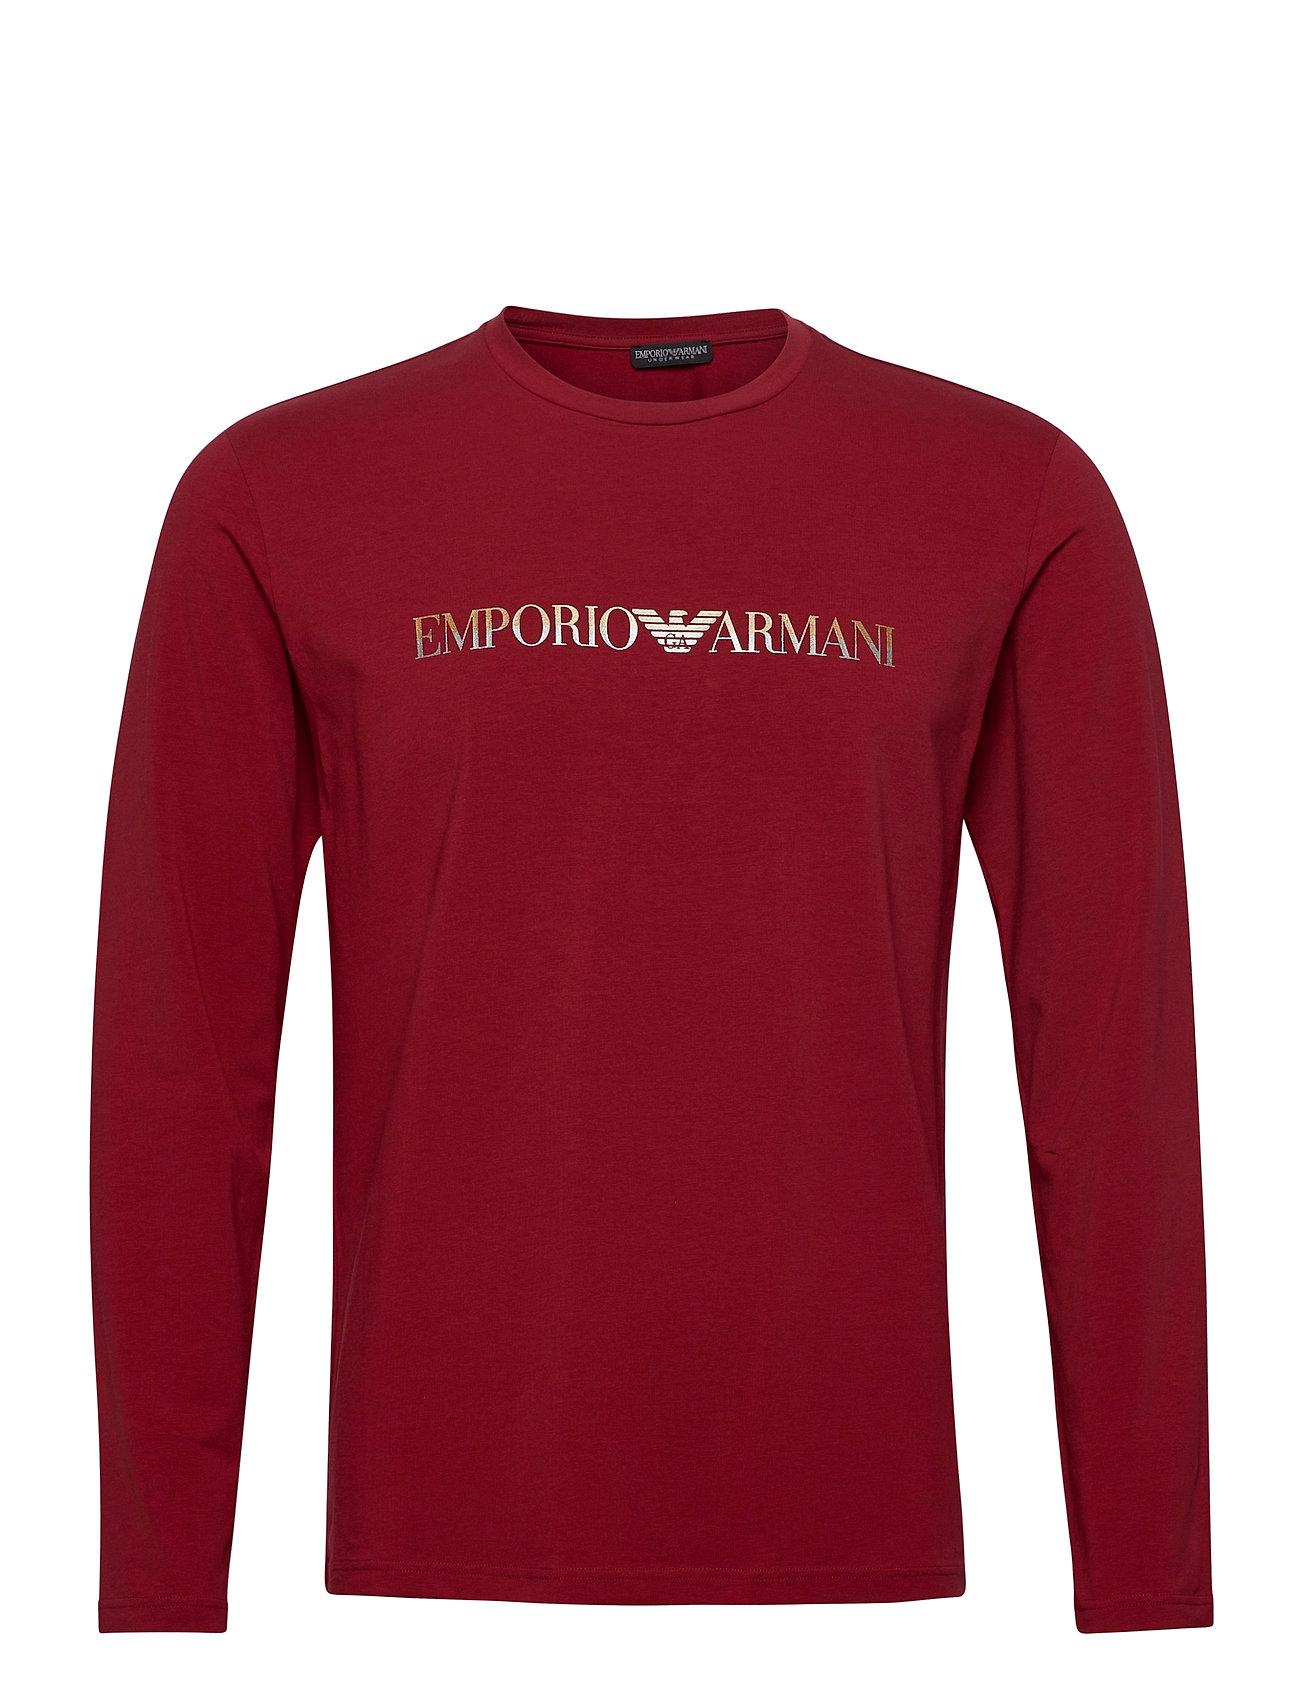 Image of T-Shirt T-Langærmet Skjorte Rød Emporio Armani (3490305101)